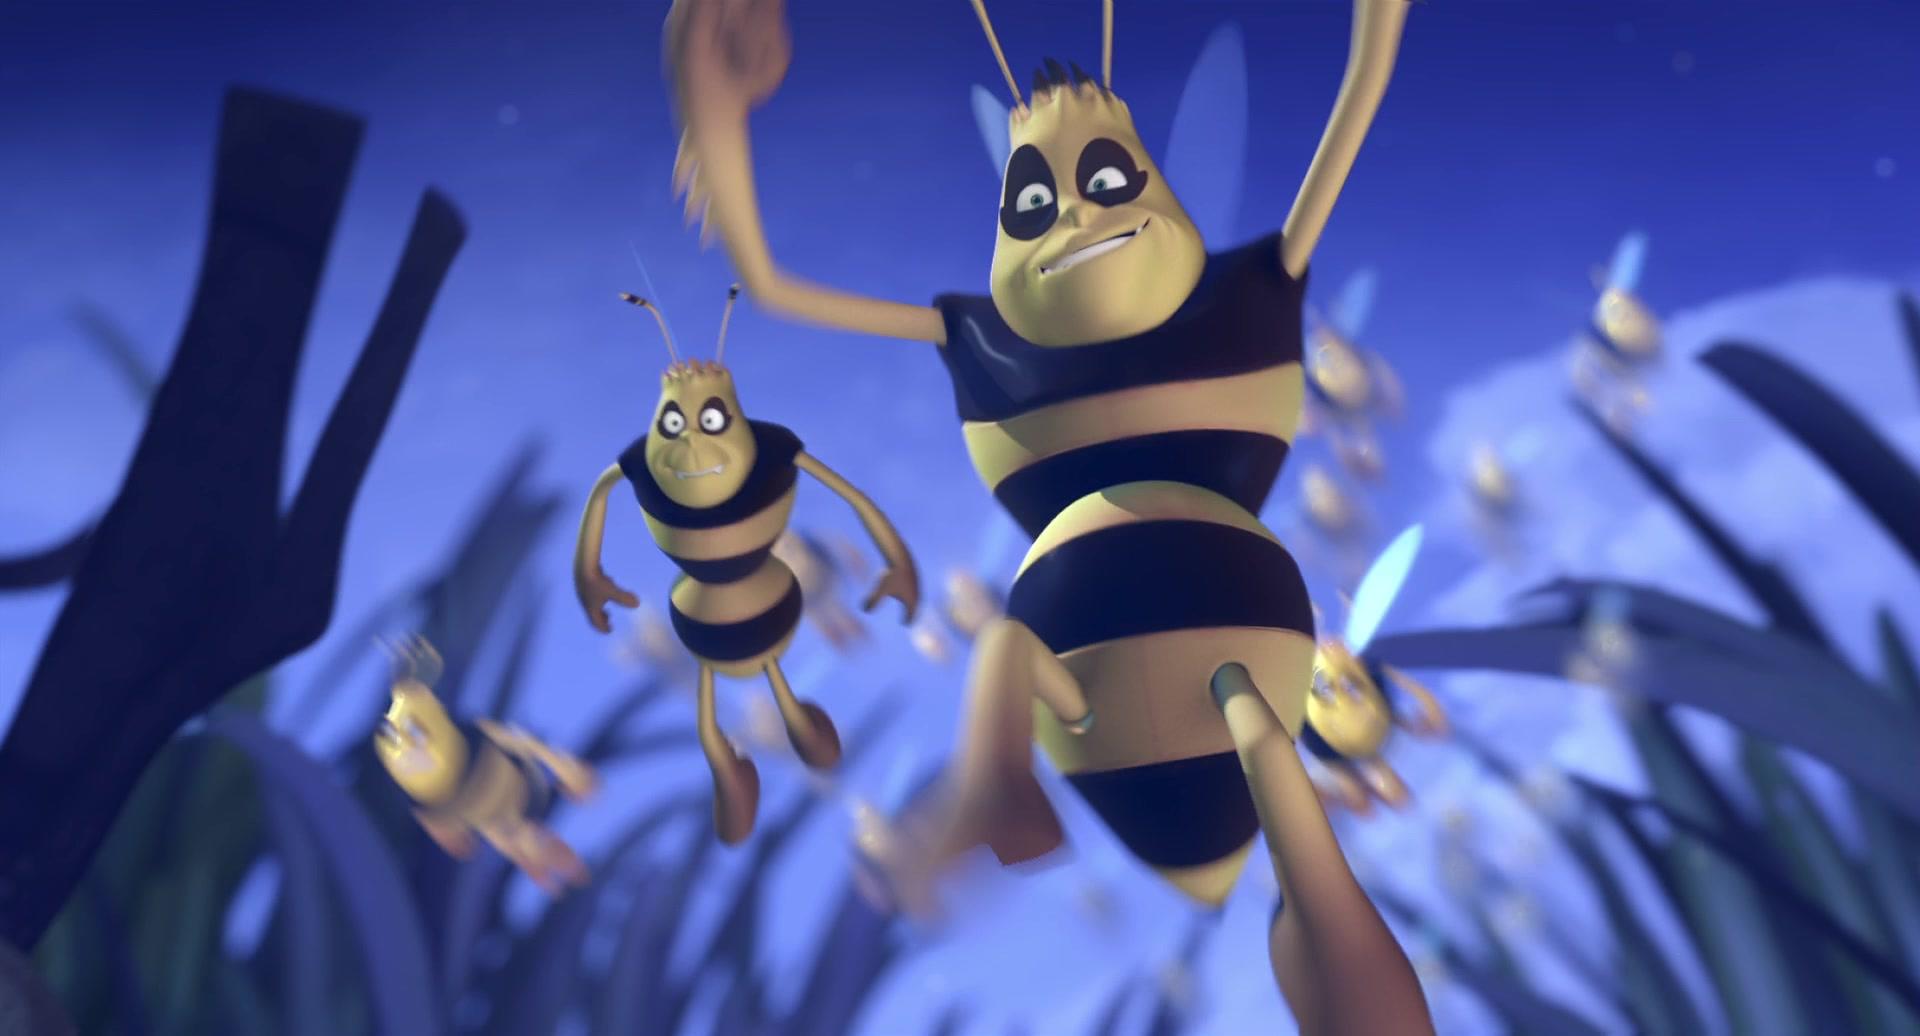 Hornets (characrers)